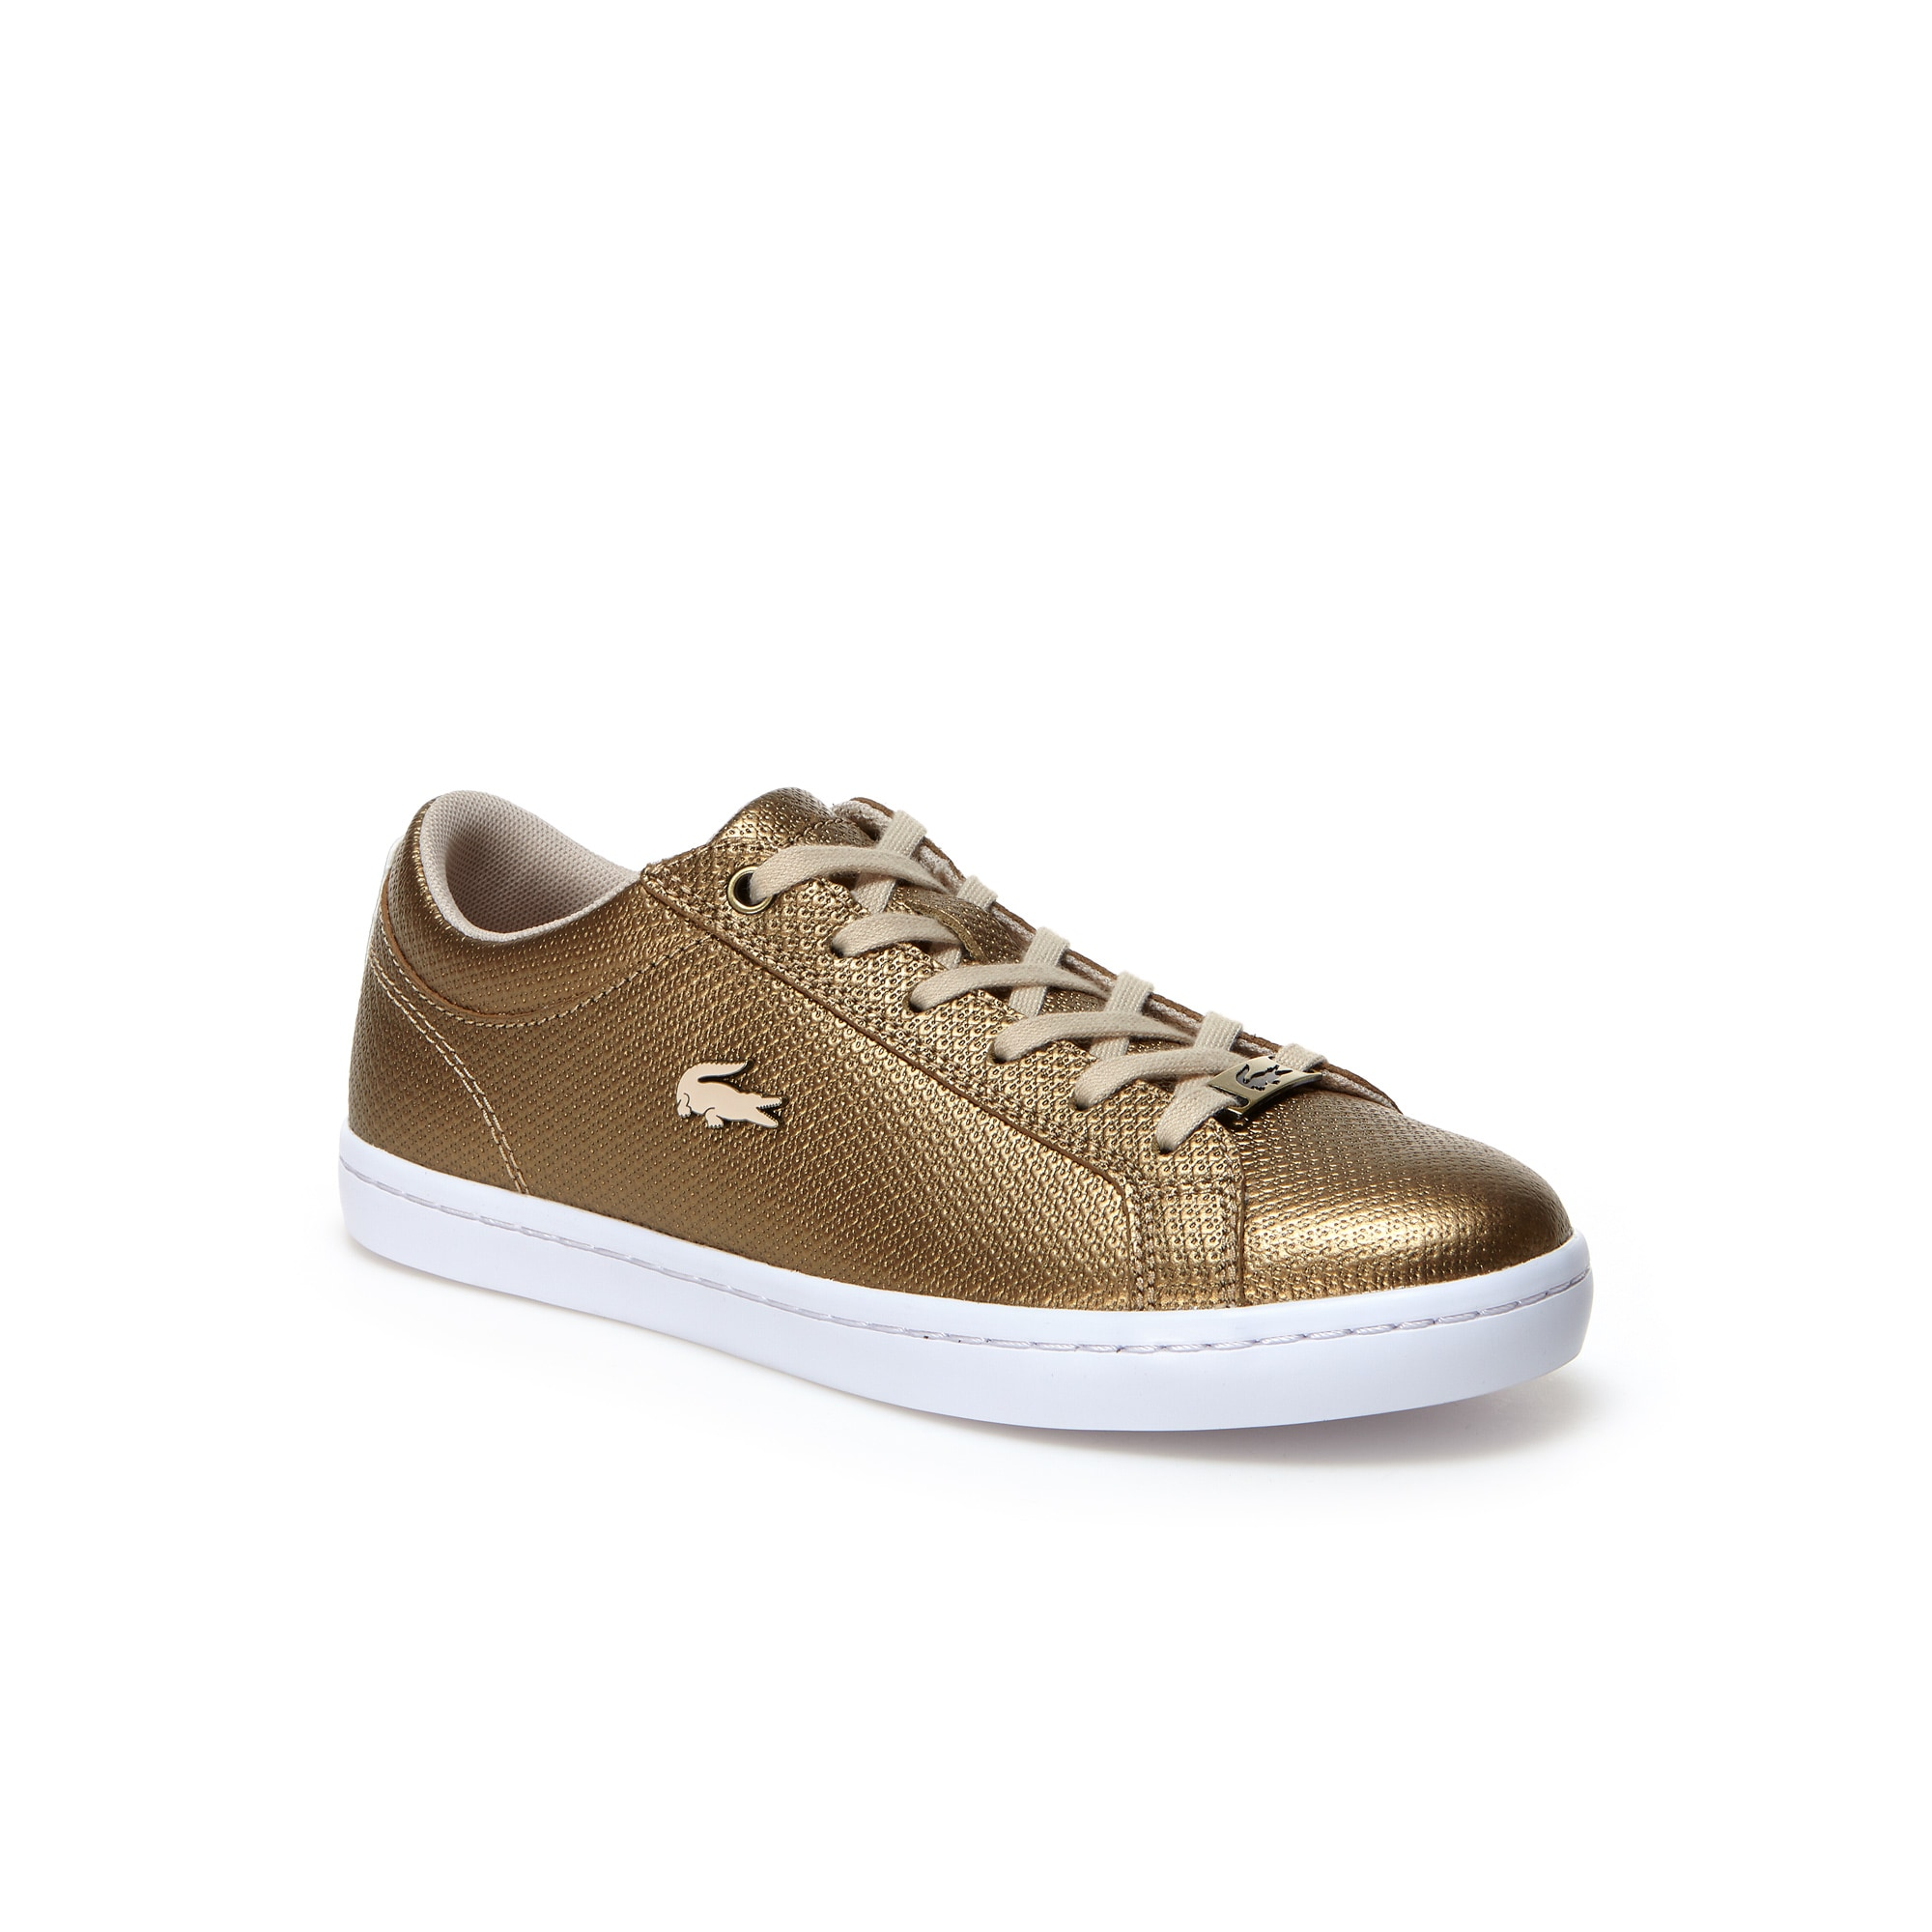 Sneakers Straightset in pelle e gomma